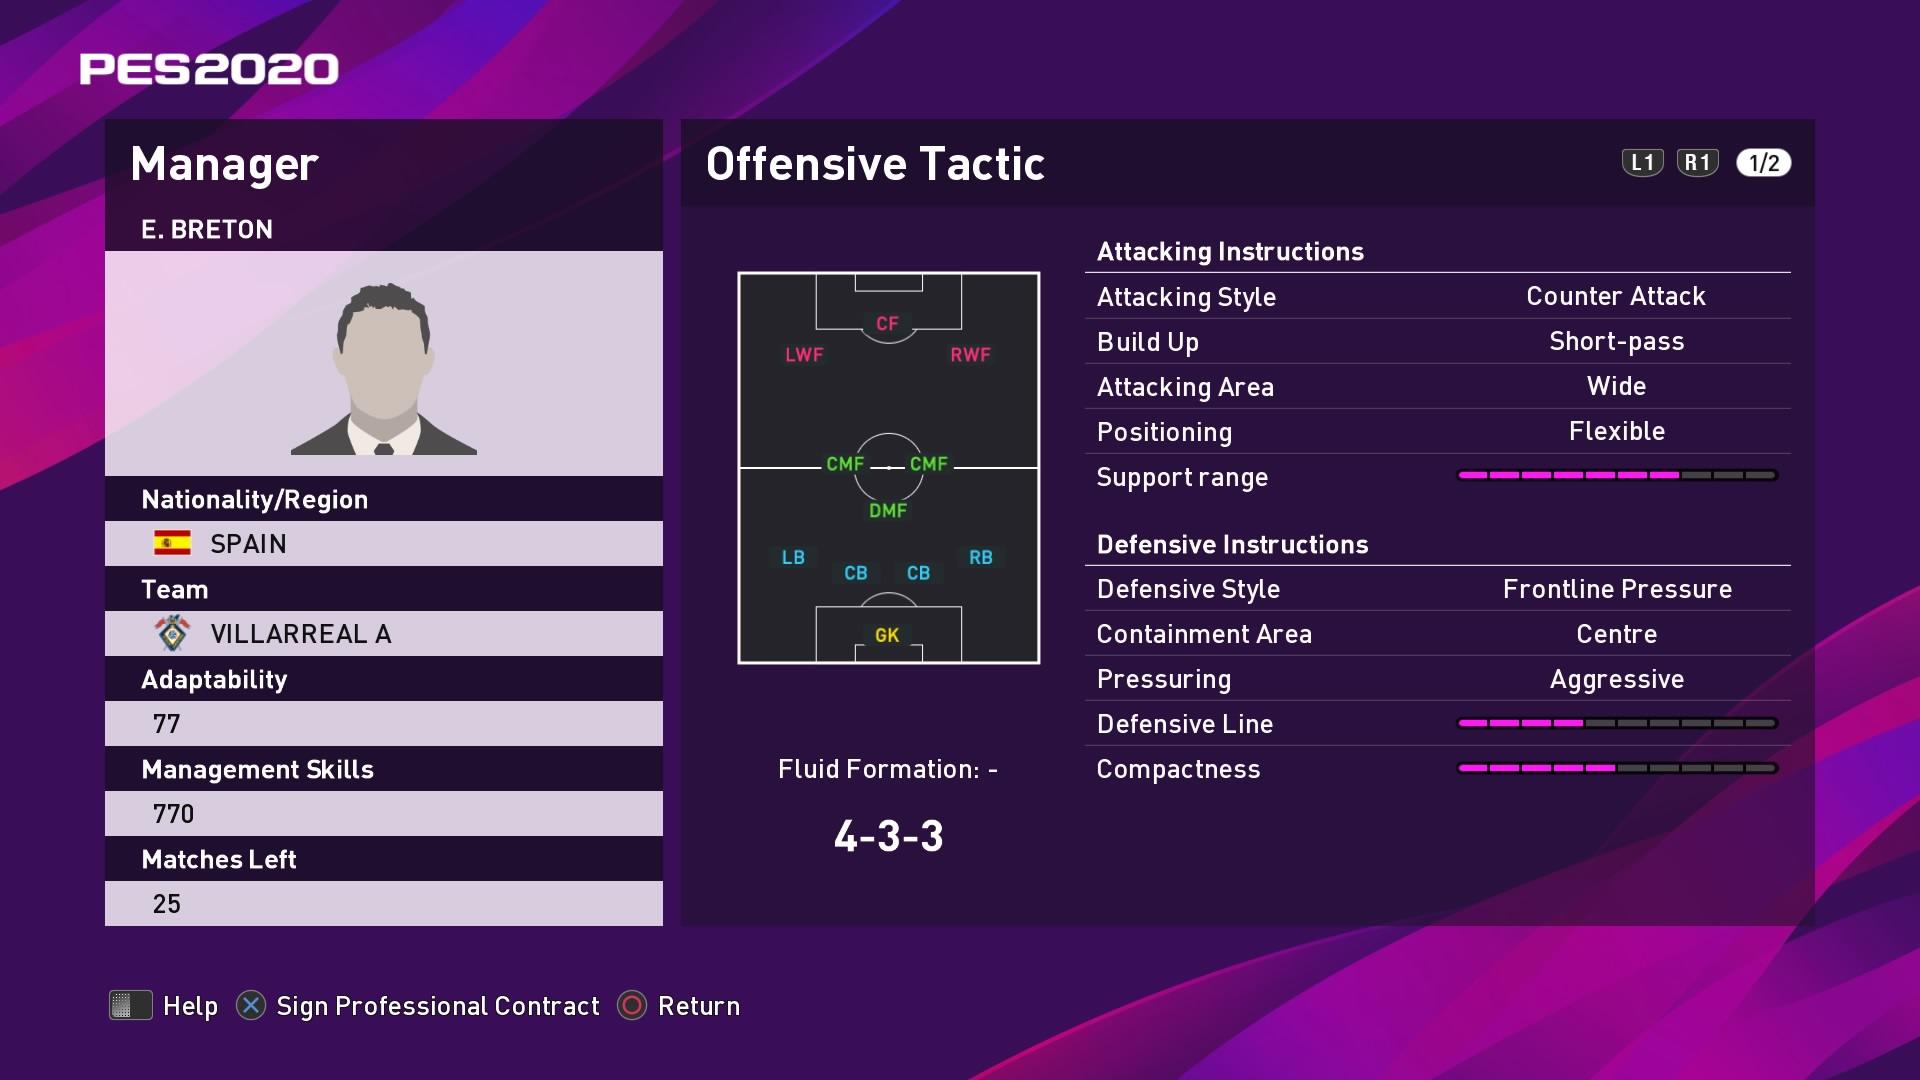 E. Breton (Javier Calleja) Offensive Tactic in PES 2020 myClub